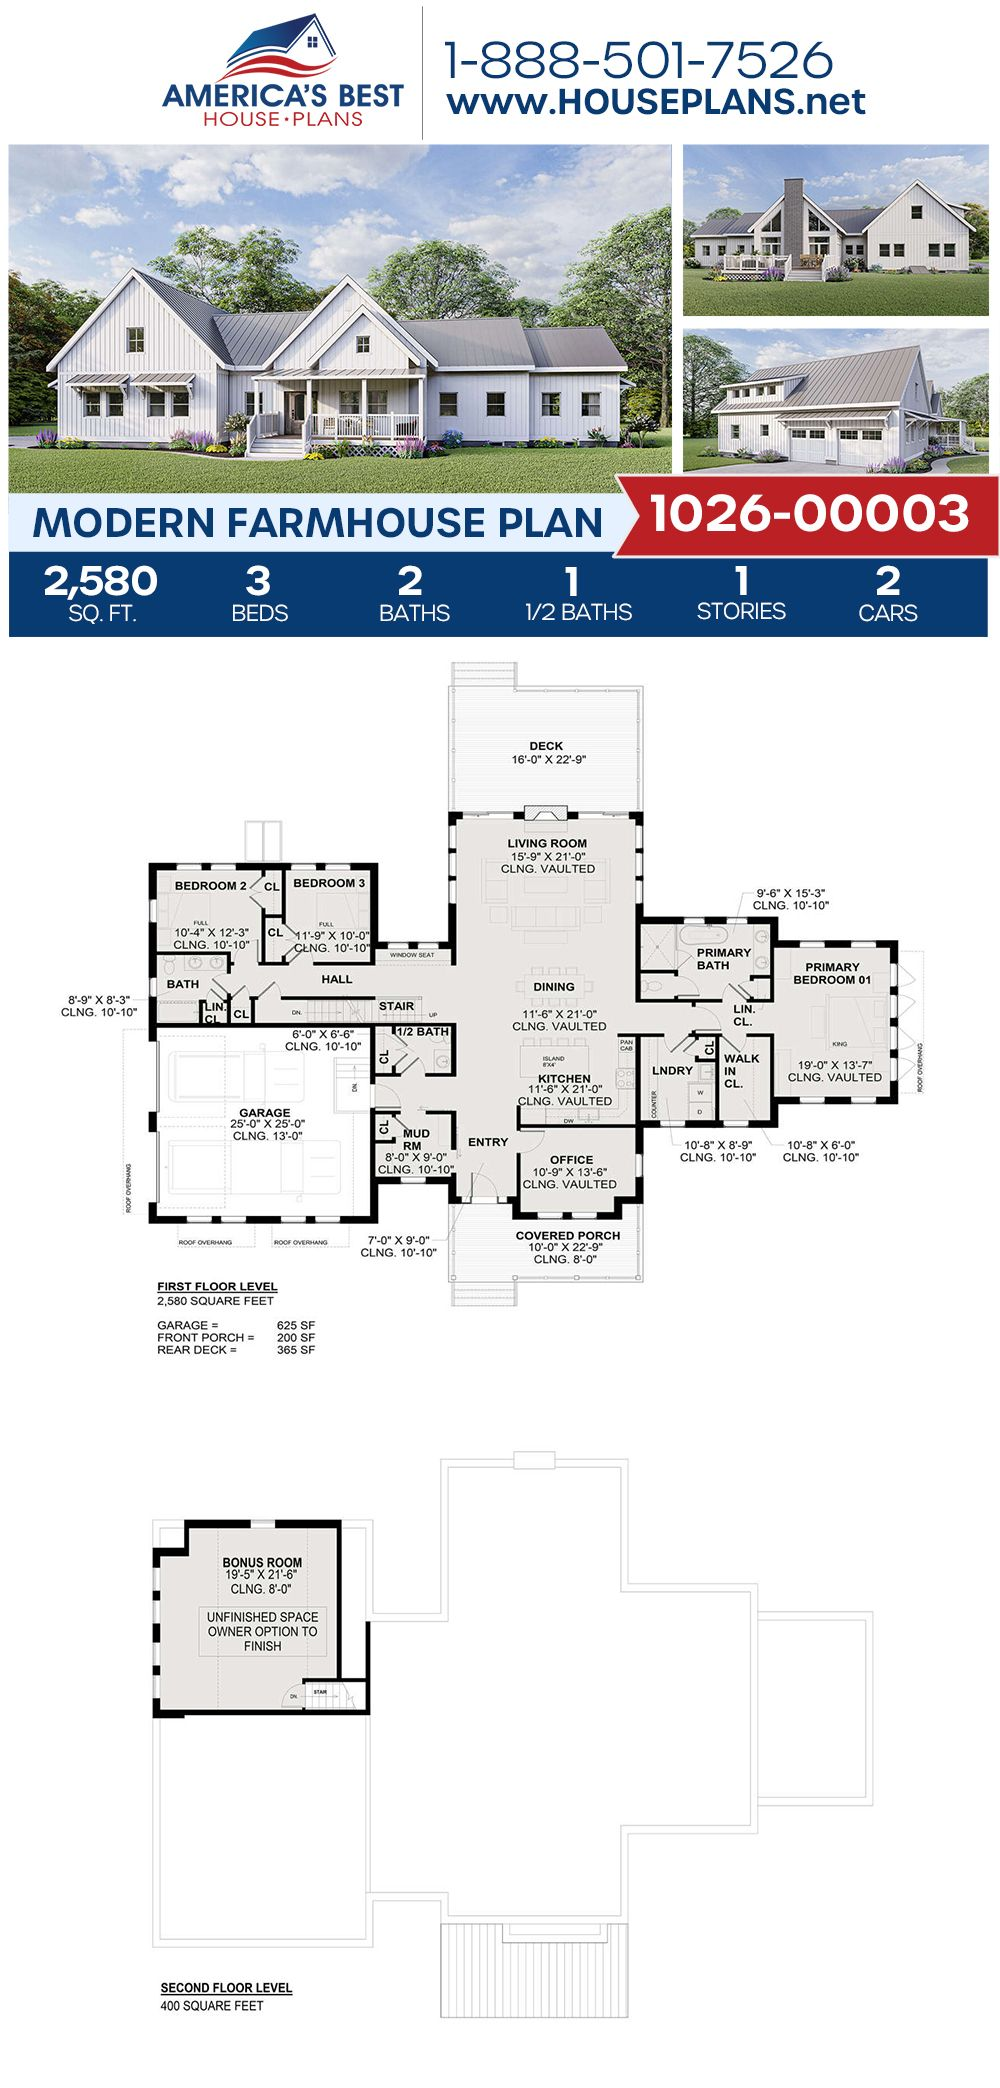 House Plan 1026 00003 Modern Farmhouse Plan 2 580 Square Feet 3 Bedrooms 2 5 Bathrooms Modern Farmhouse Plans Farmhouse Plans House Plans Farmhouse